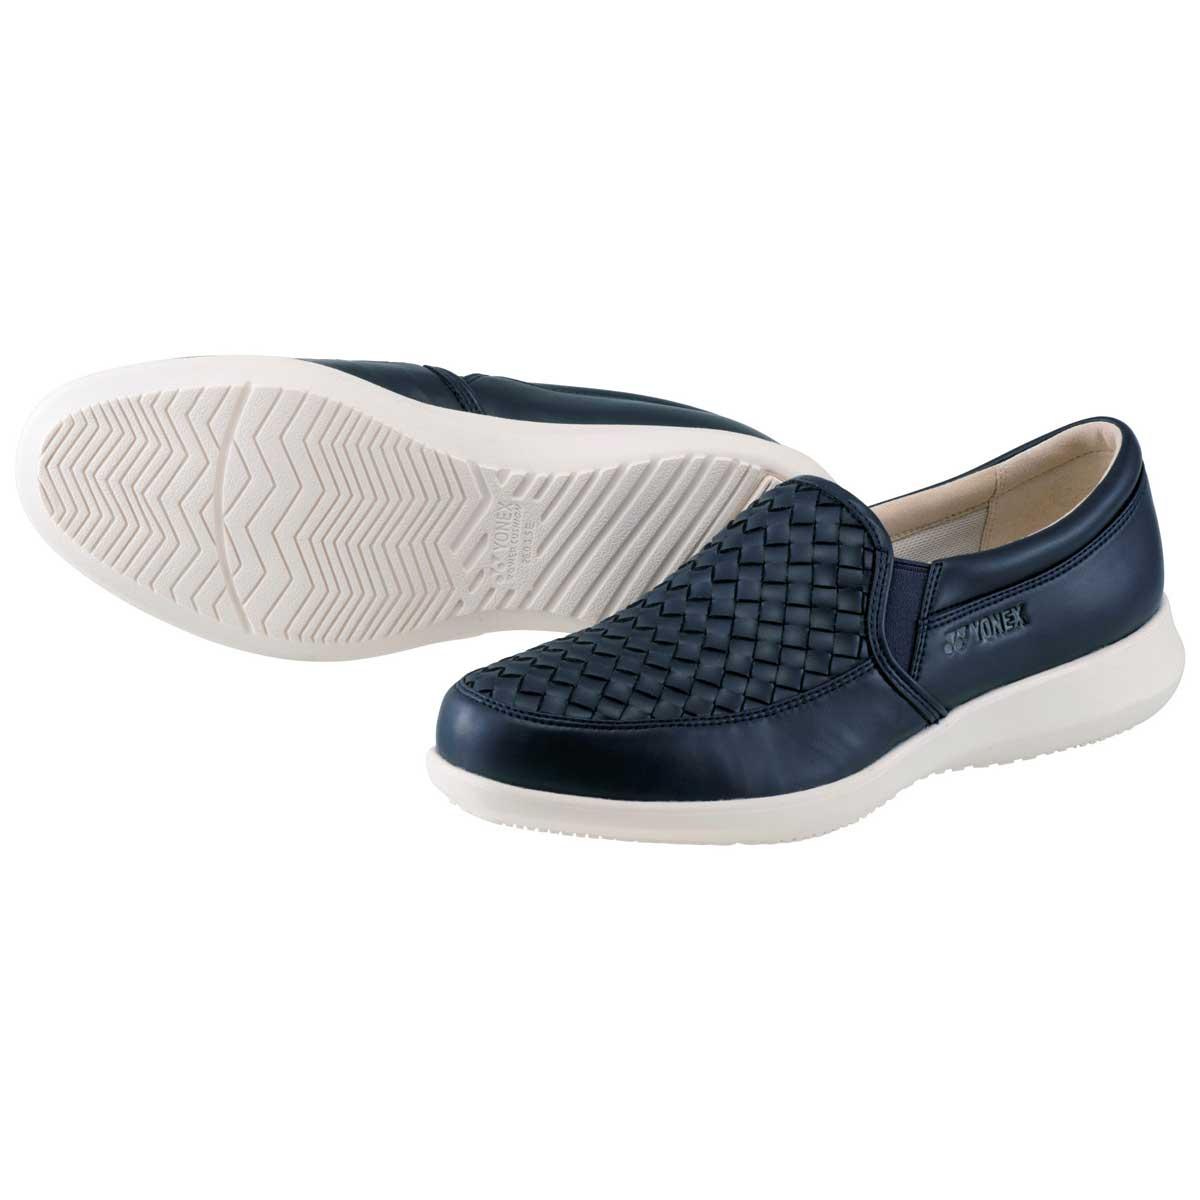 YONEX ヨネックス MC80 ネイビーブルー (メンズ)軽い疲れにくいウォーキングシューズ「靴」